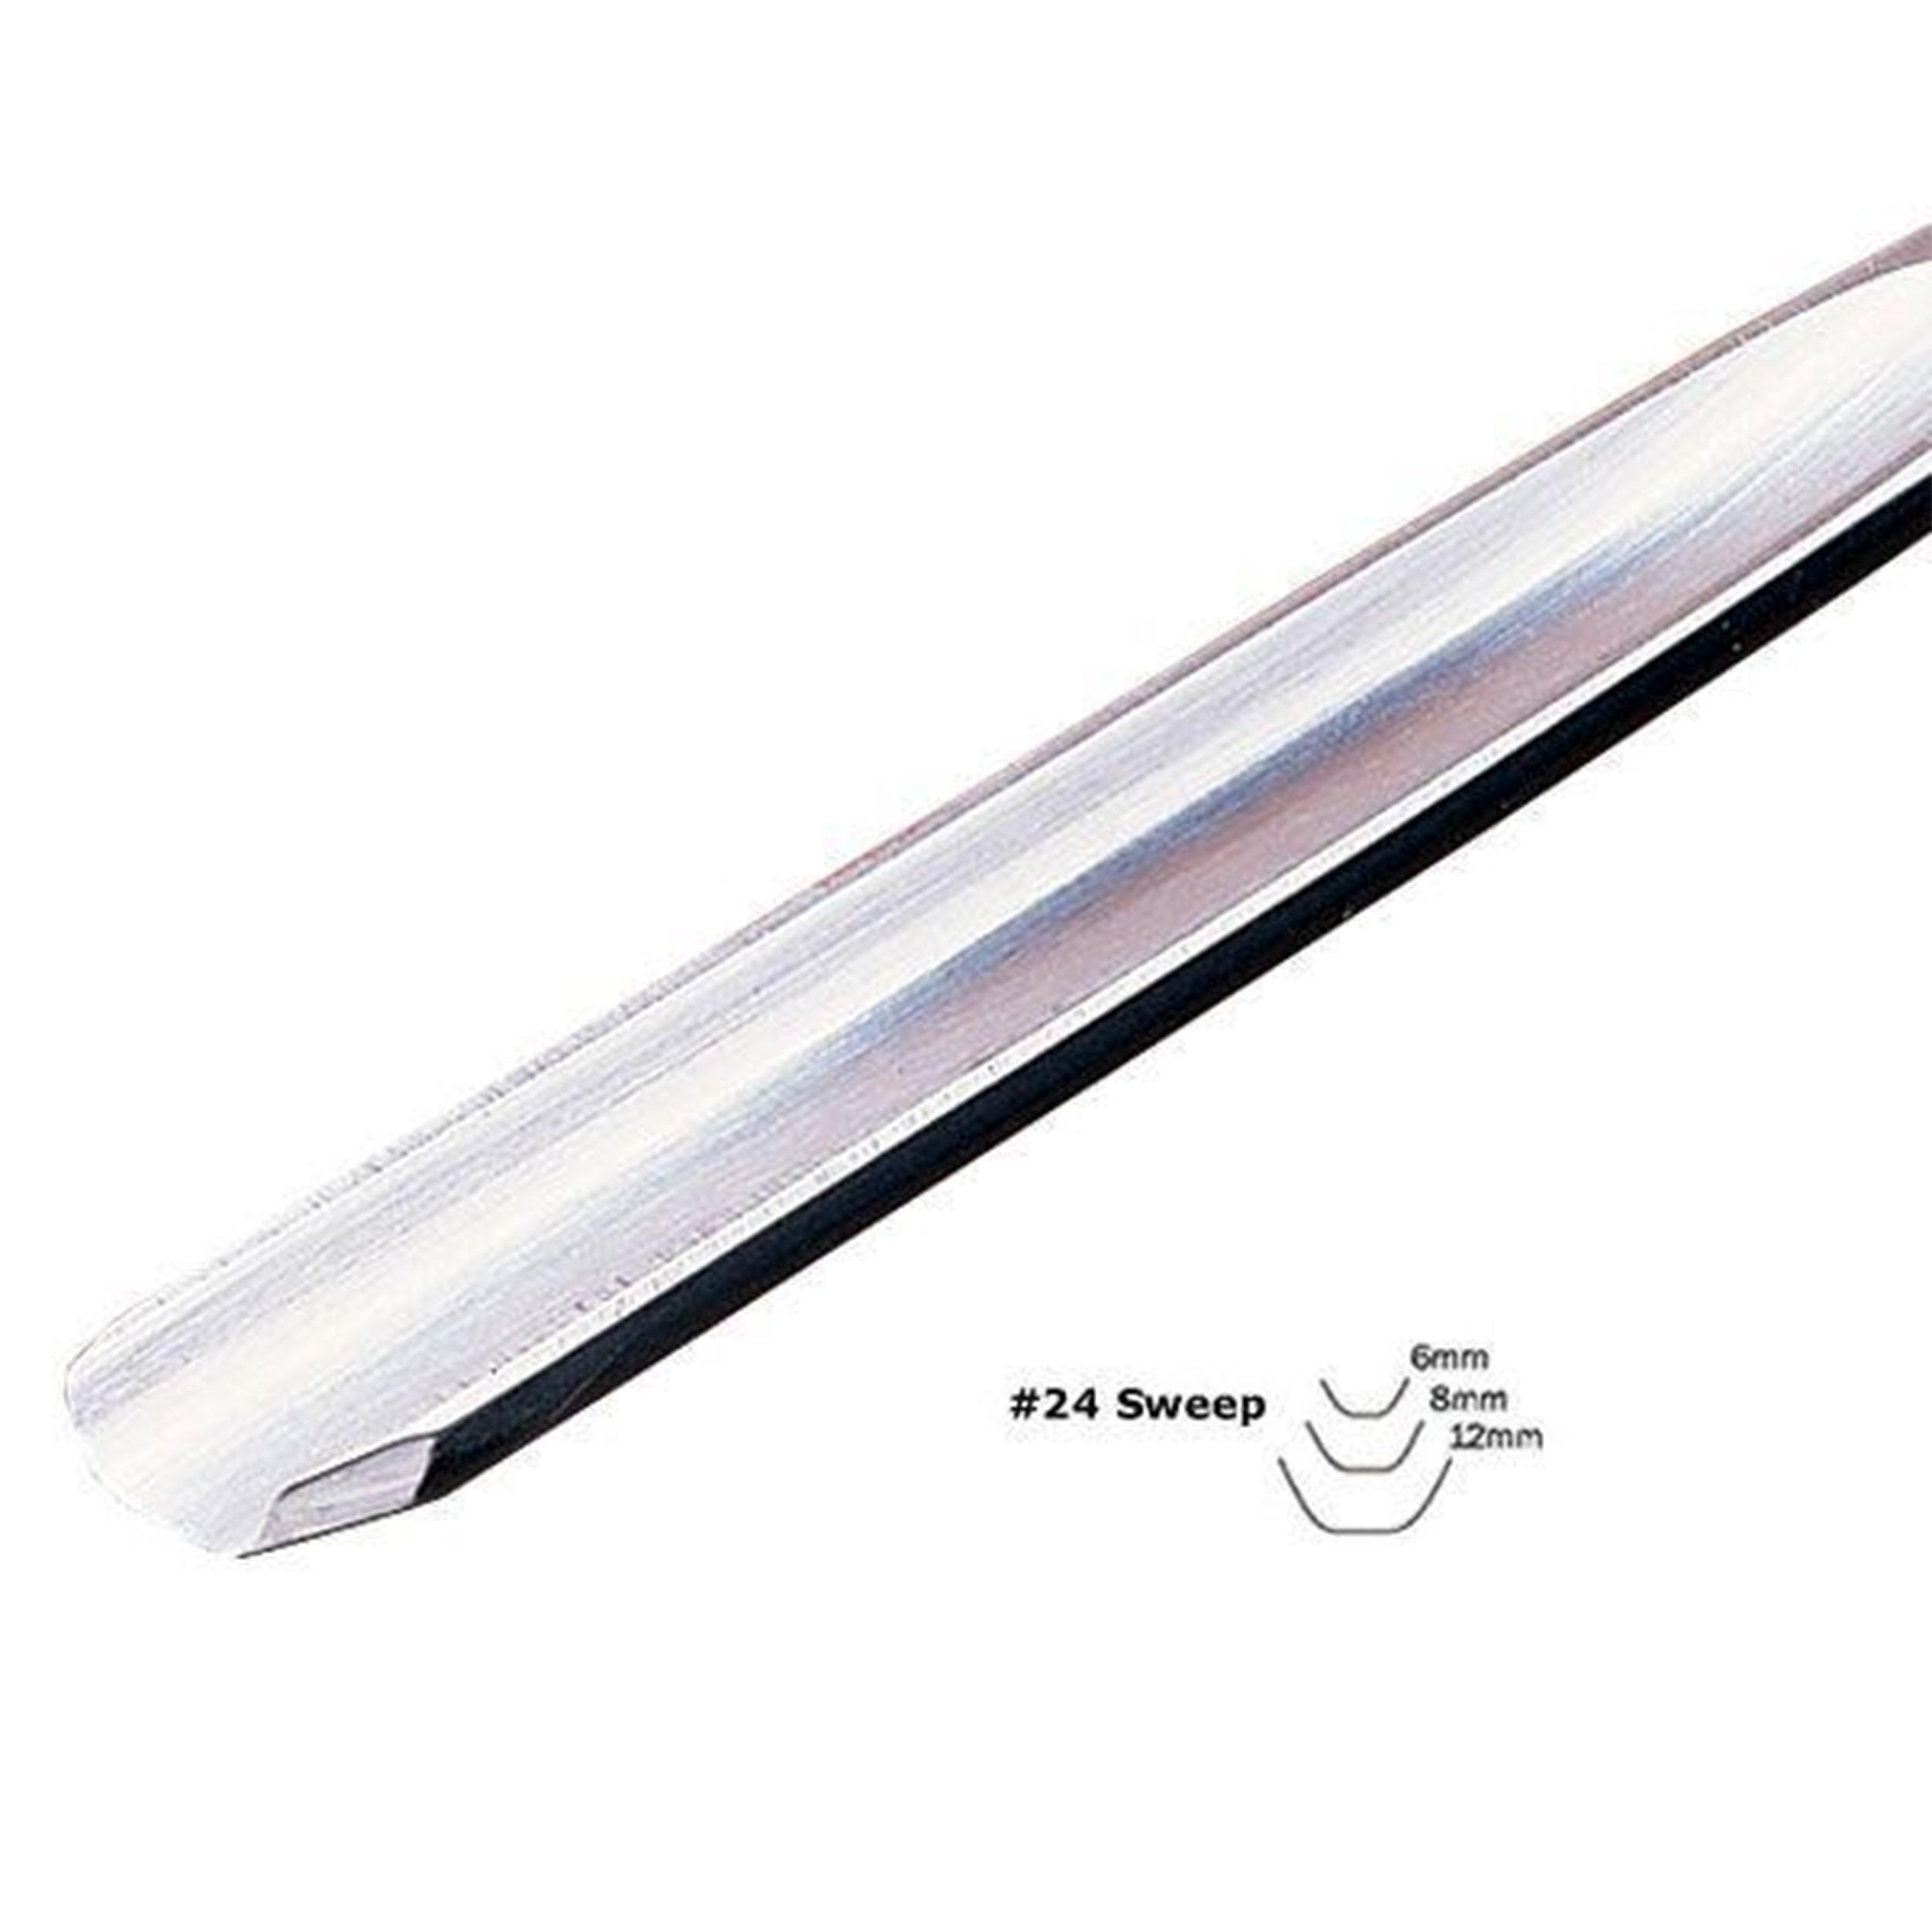 #24 Sweep Fluteroni Gouge 6 mm, Full Size